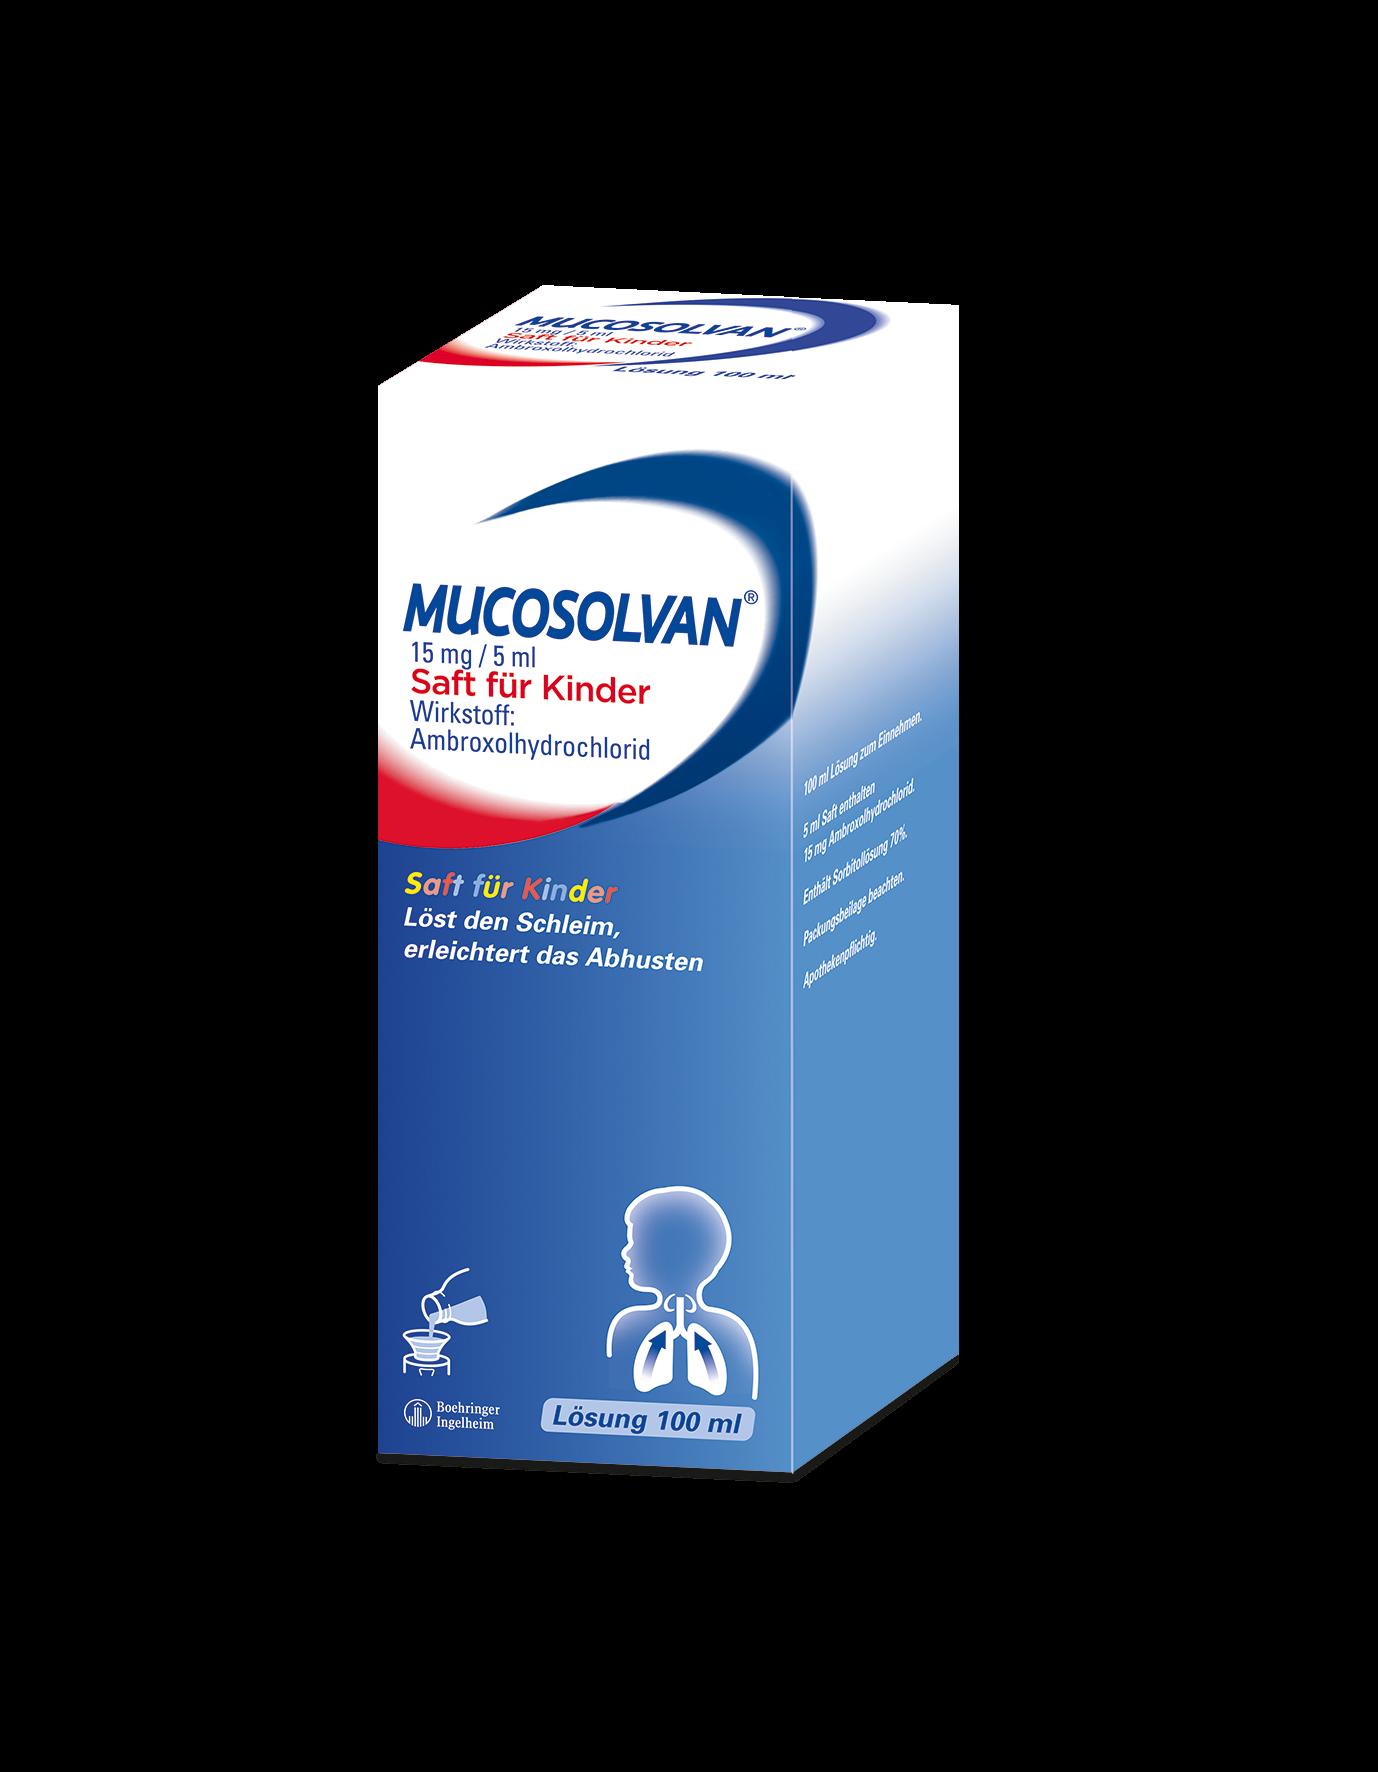 Mucosolvan® 15 mg/5 ml - Saft